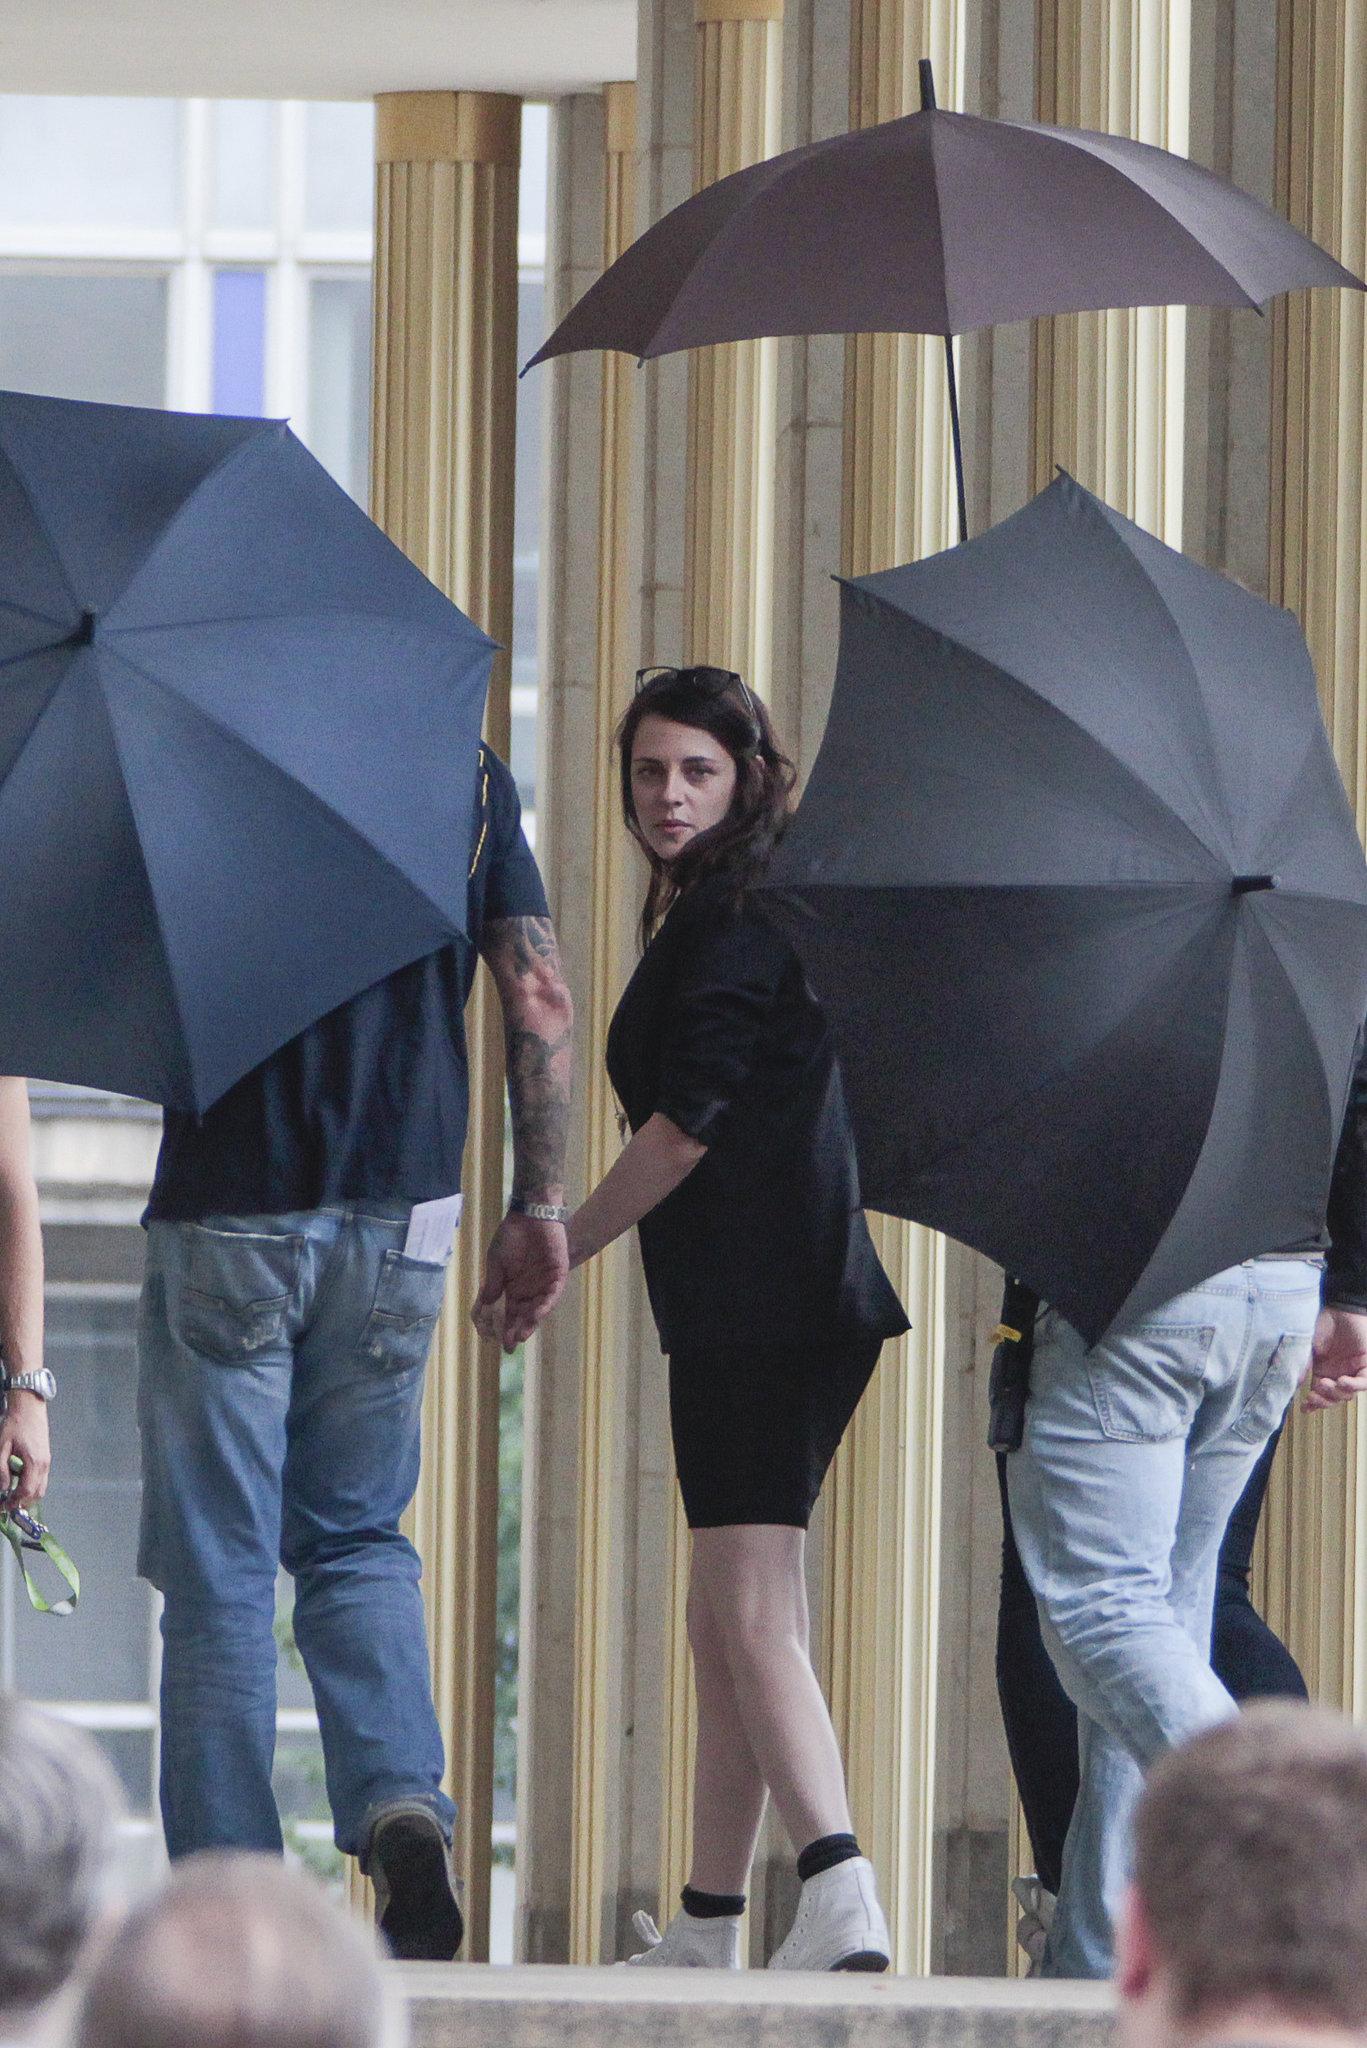 Kristen Stewart wore an all-black ensemble on set in Berlin.